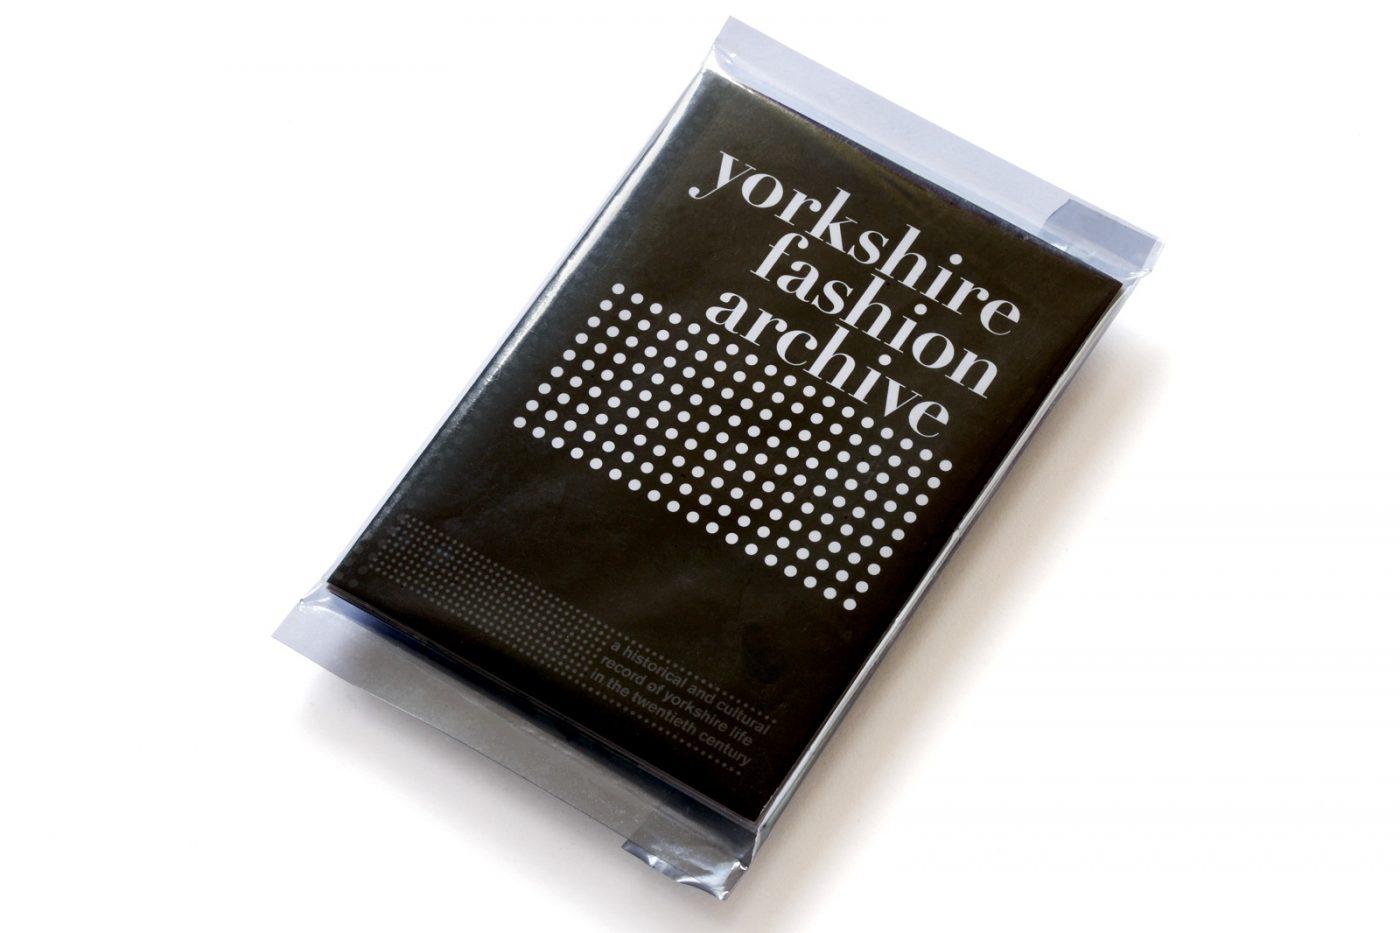 Yorkshire Fashion Archive